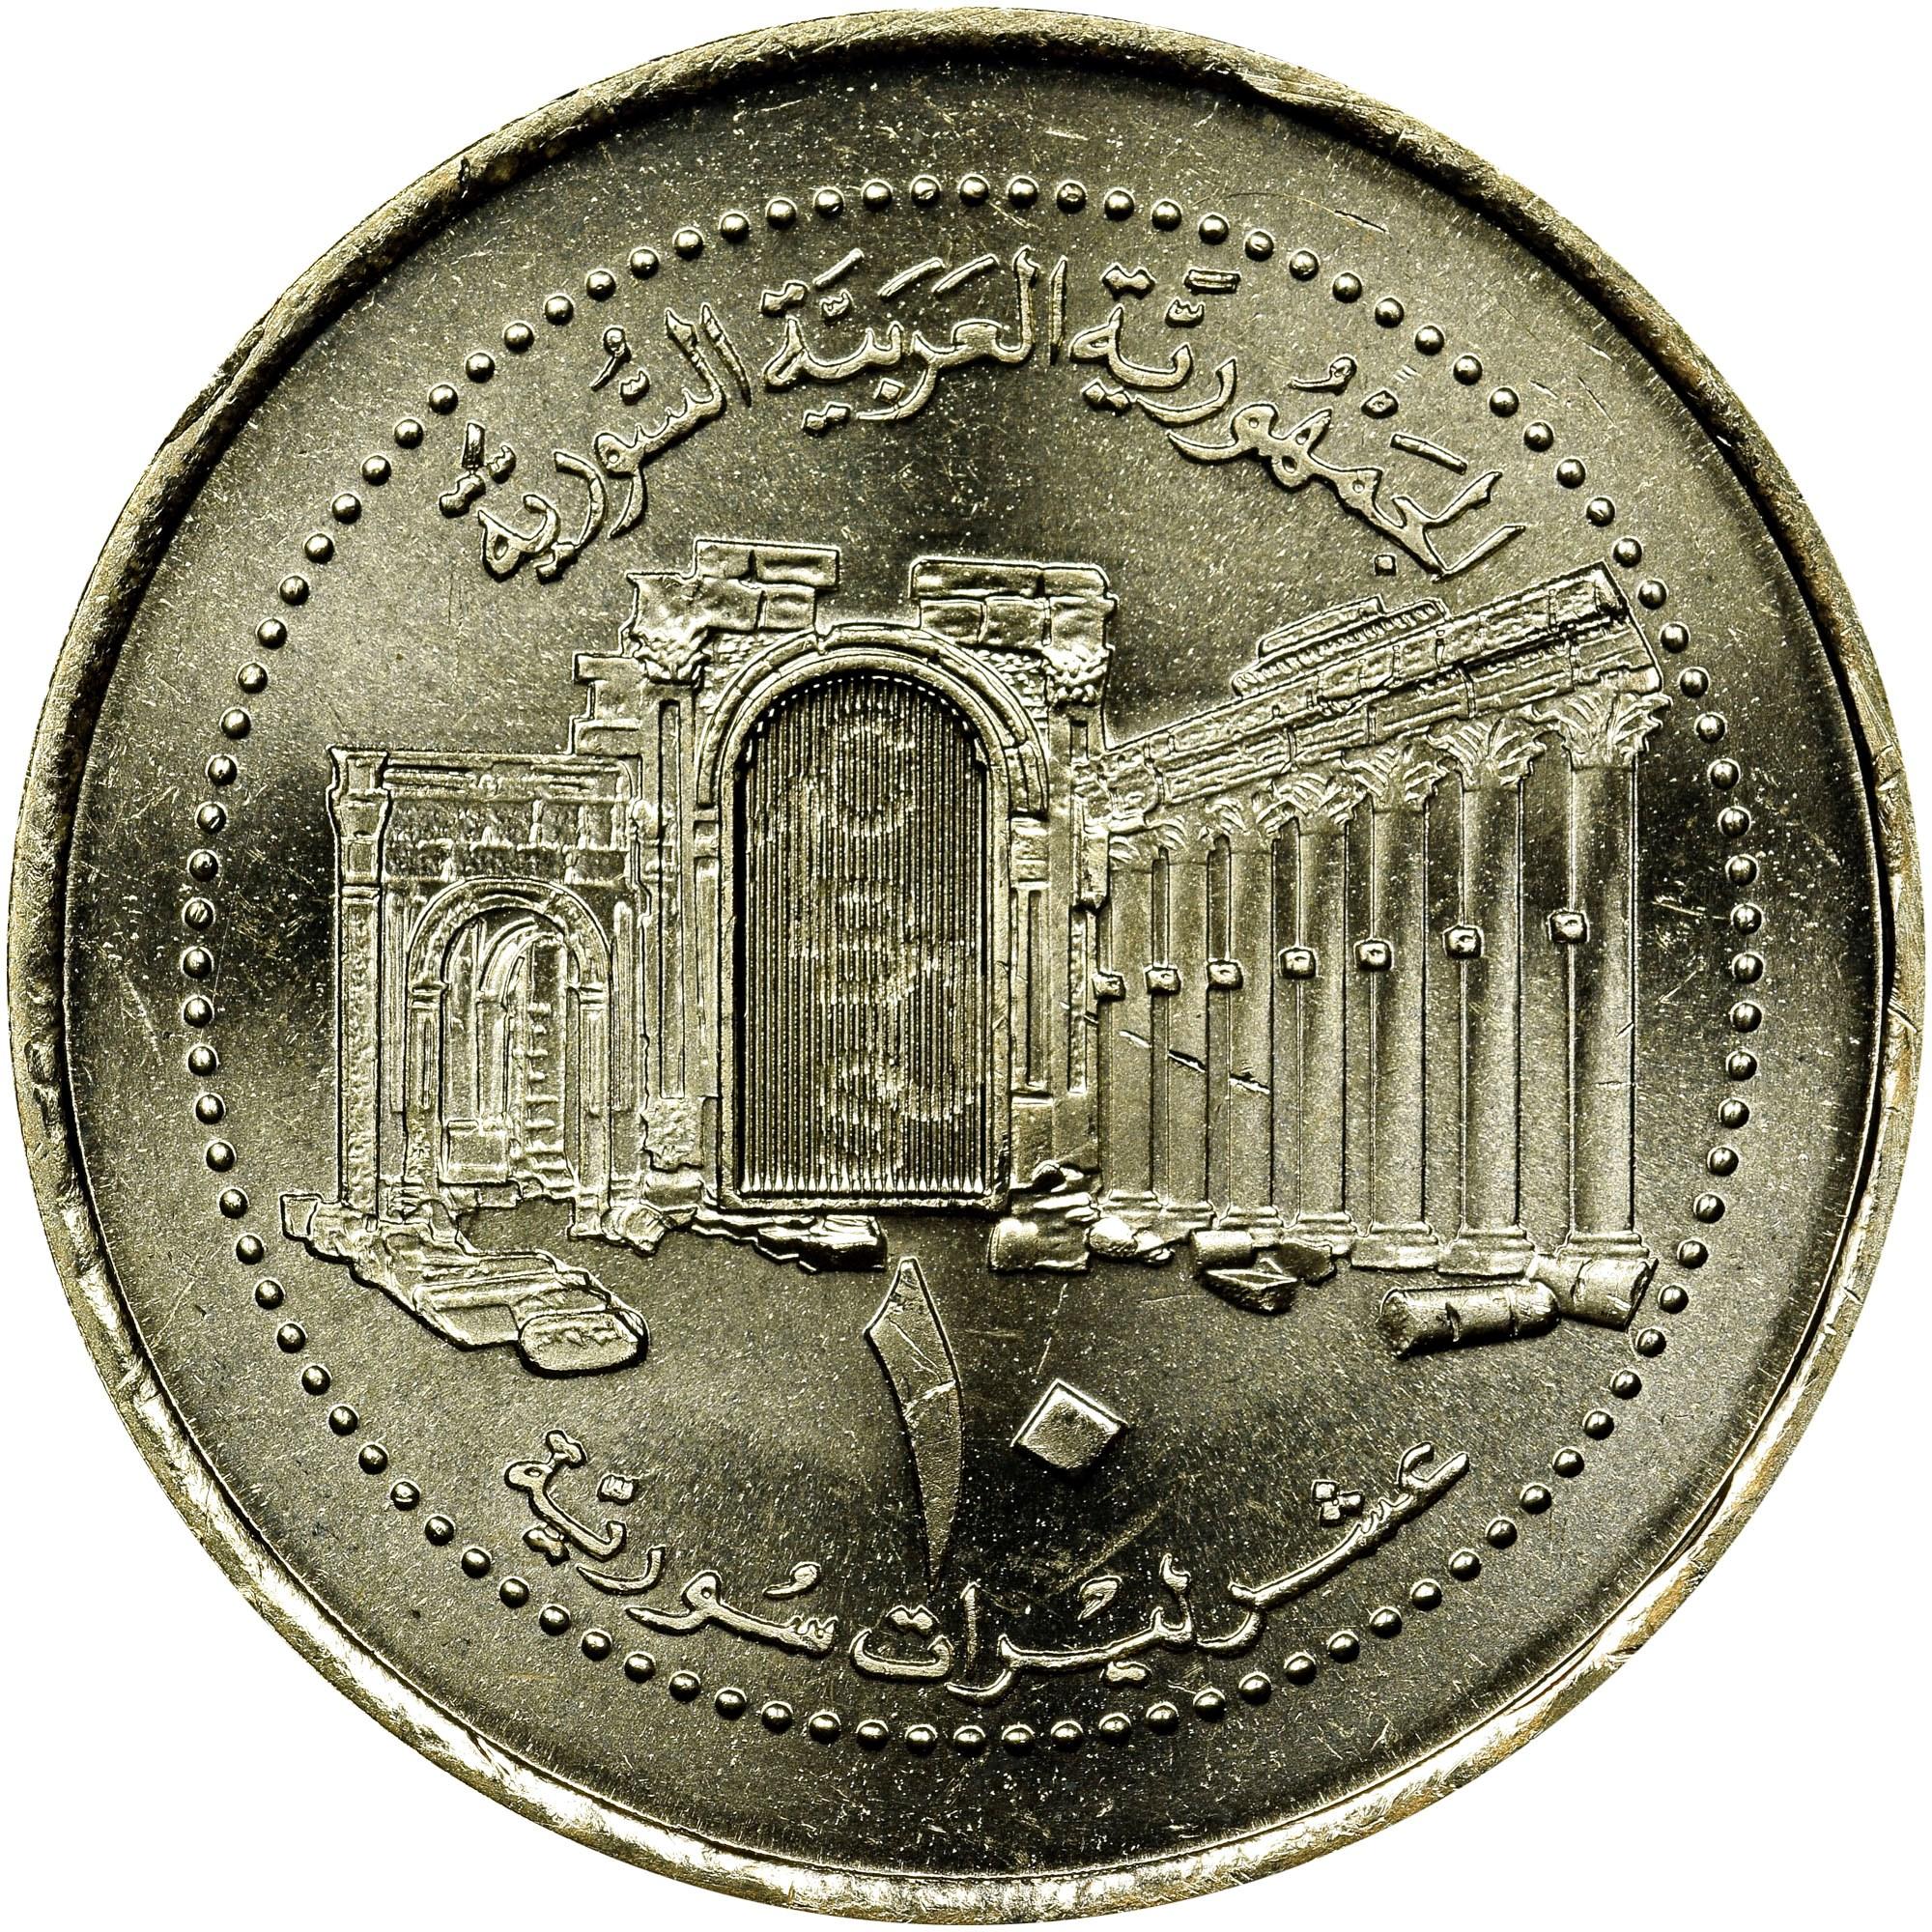 Syria 10 Pounds reverse